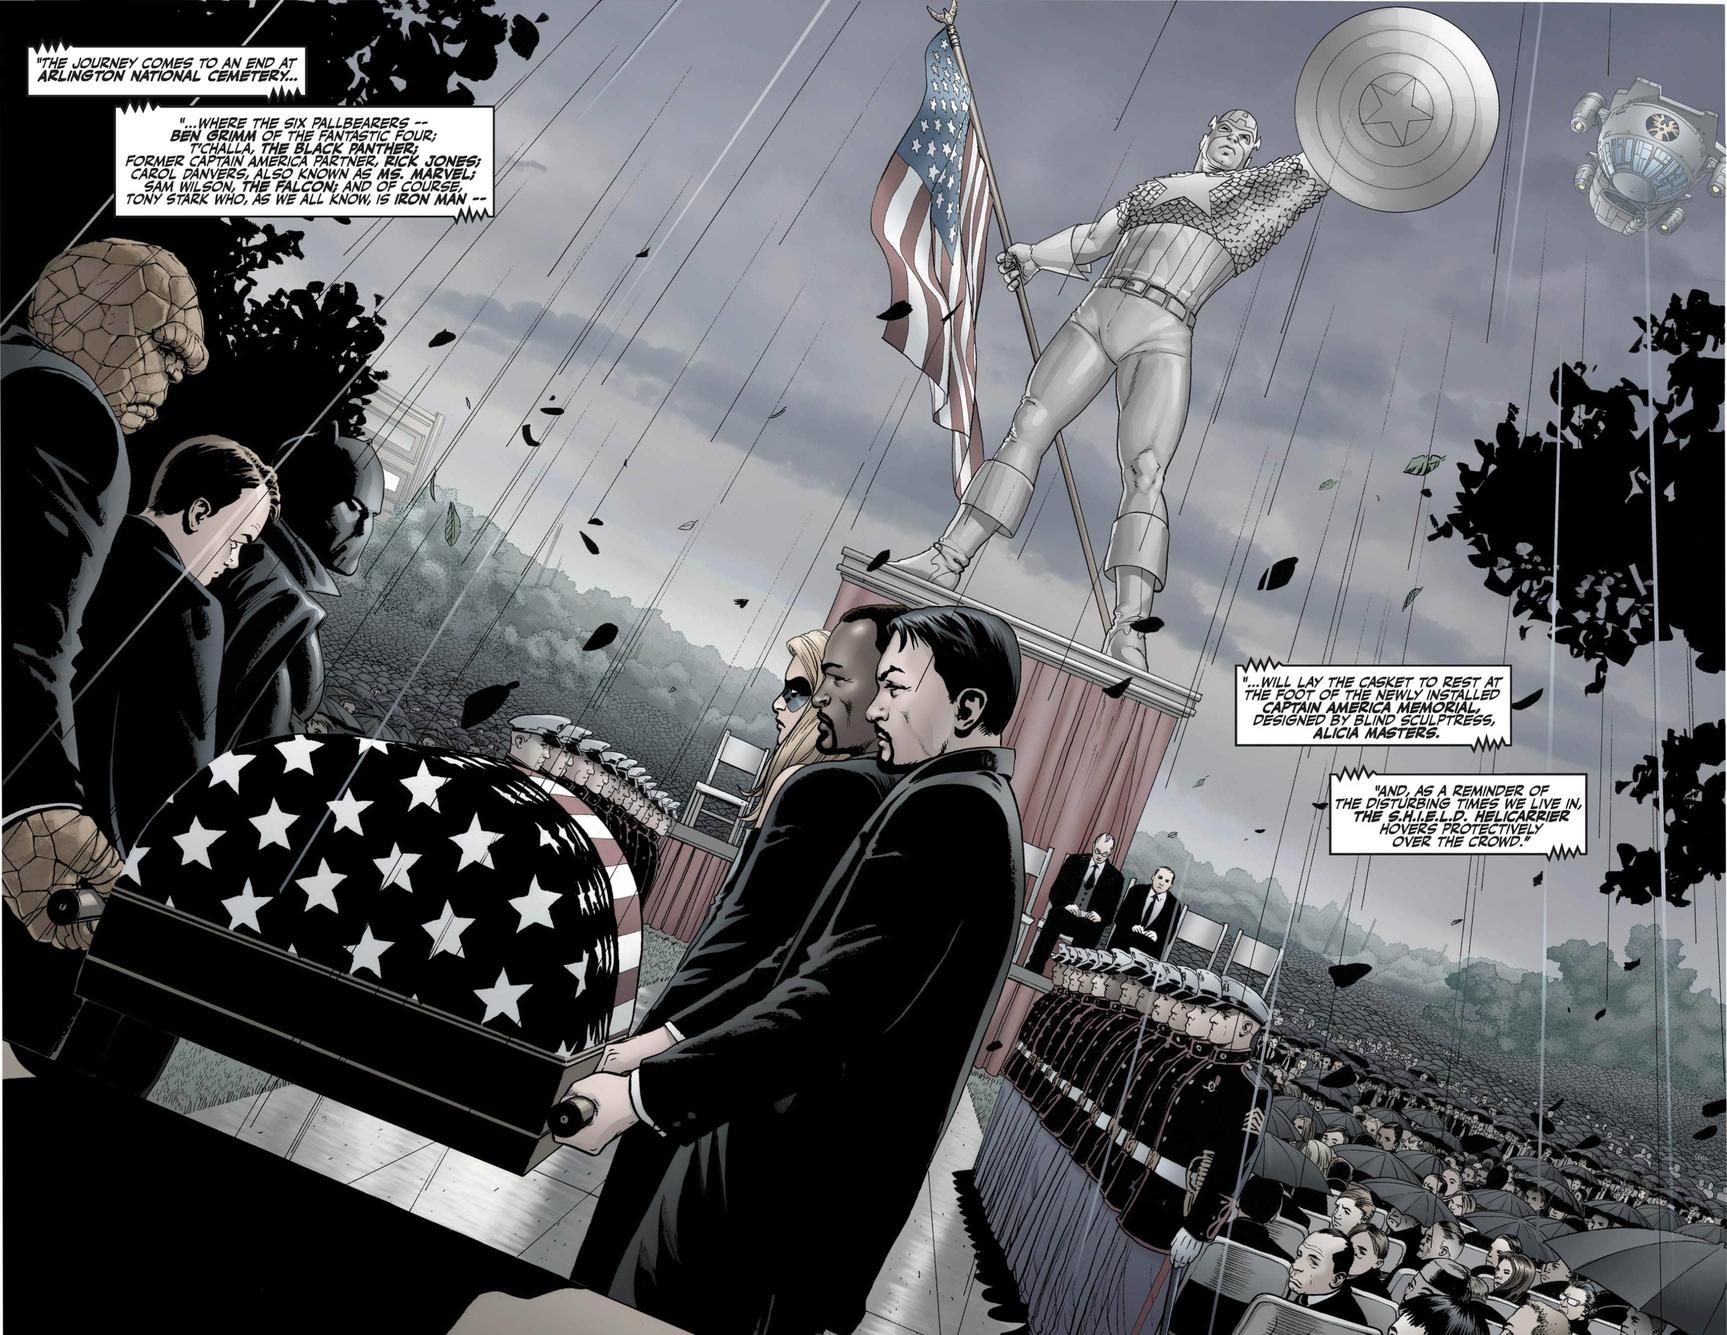 Captain America funeral